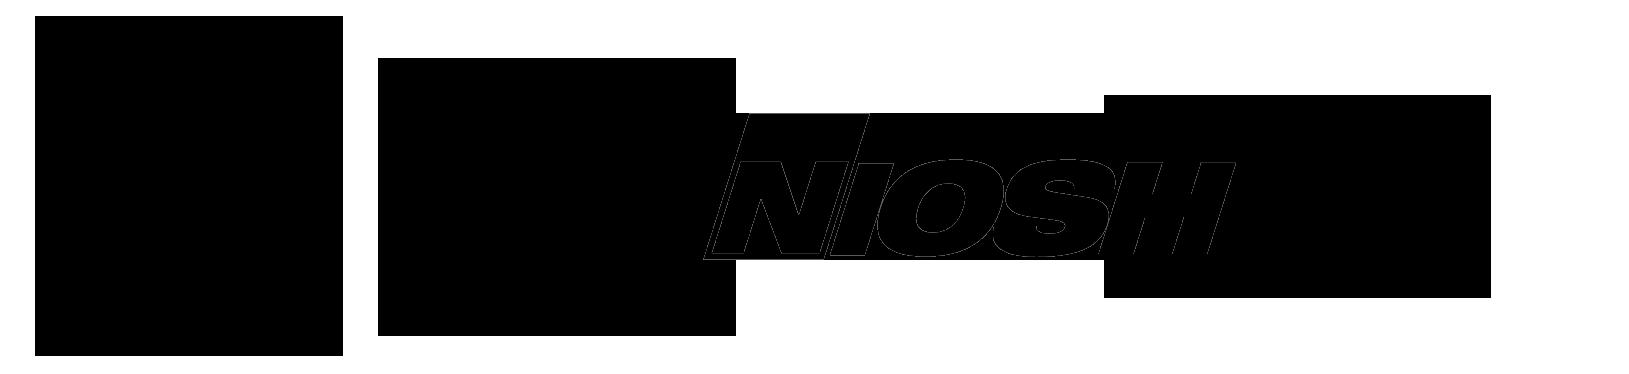 NIOSH-black-3-logos